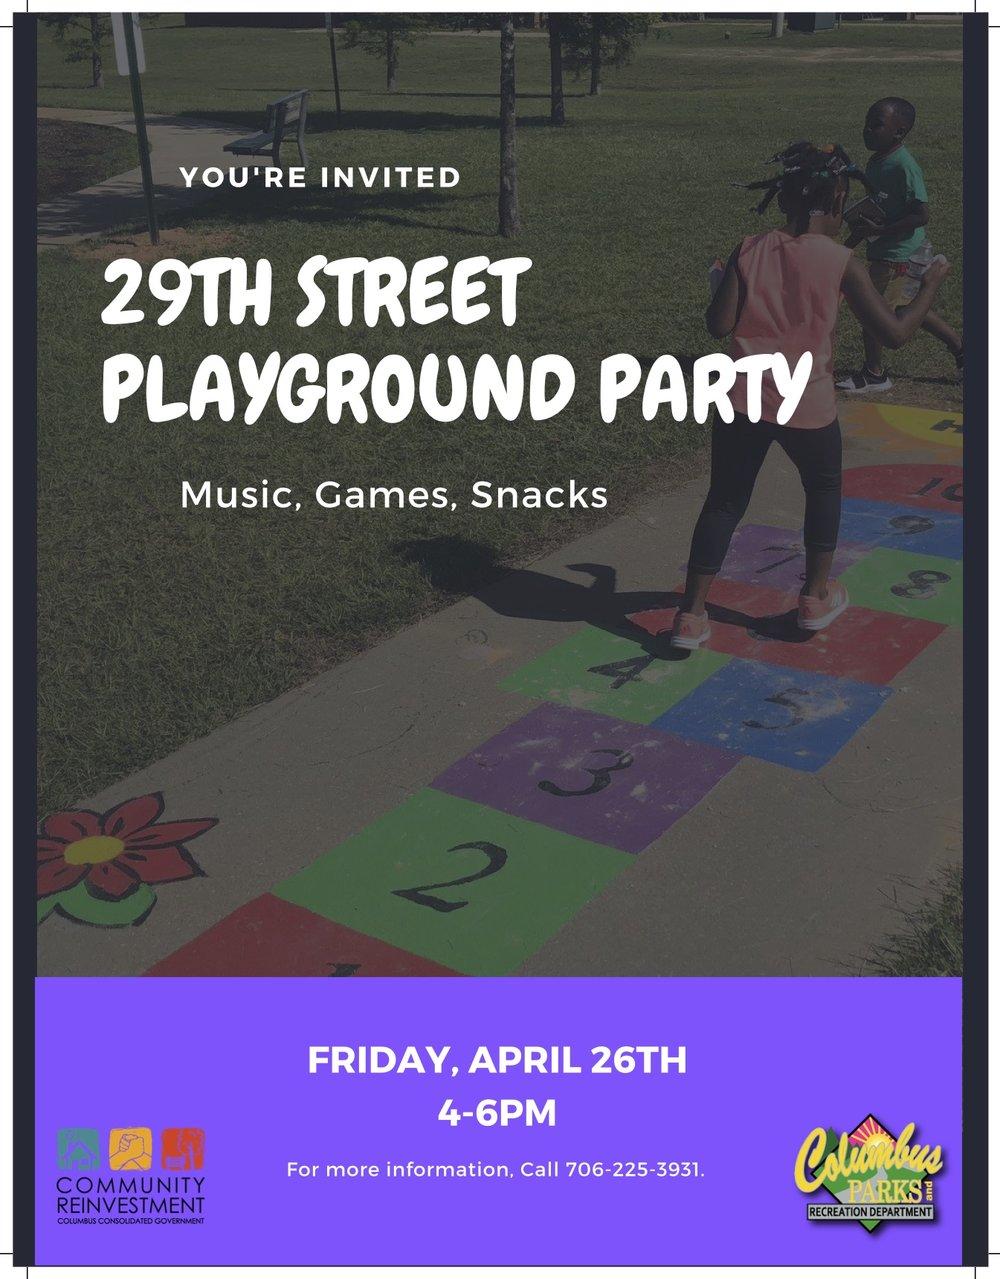 29th Street Playground Party.jpg